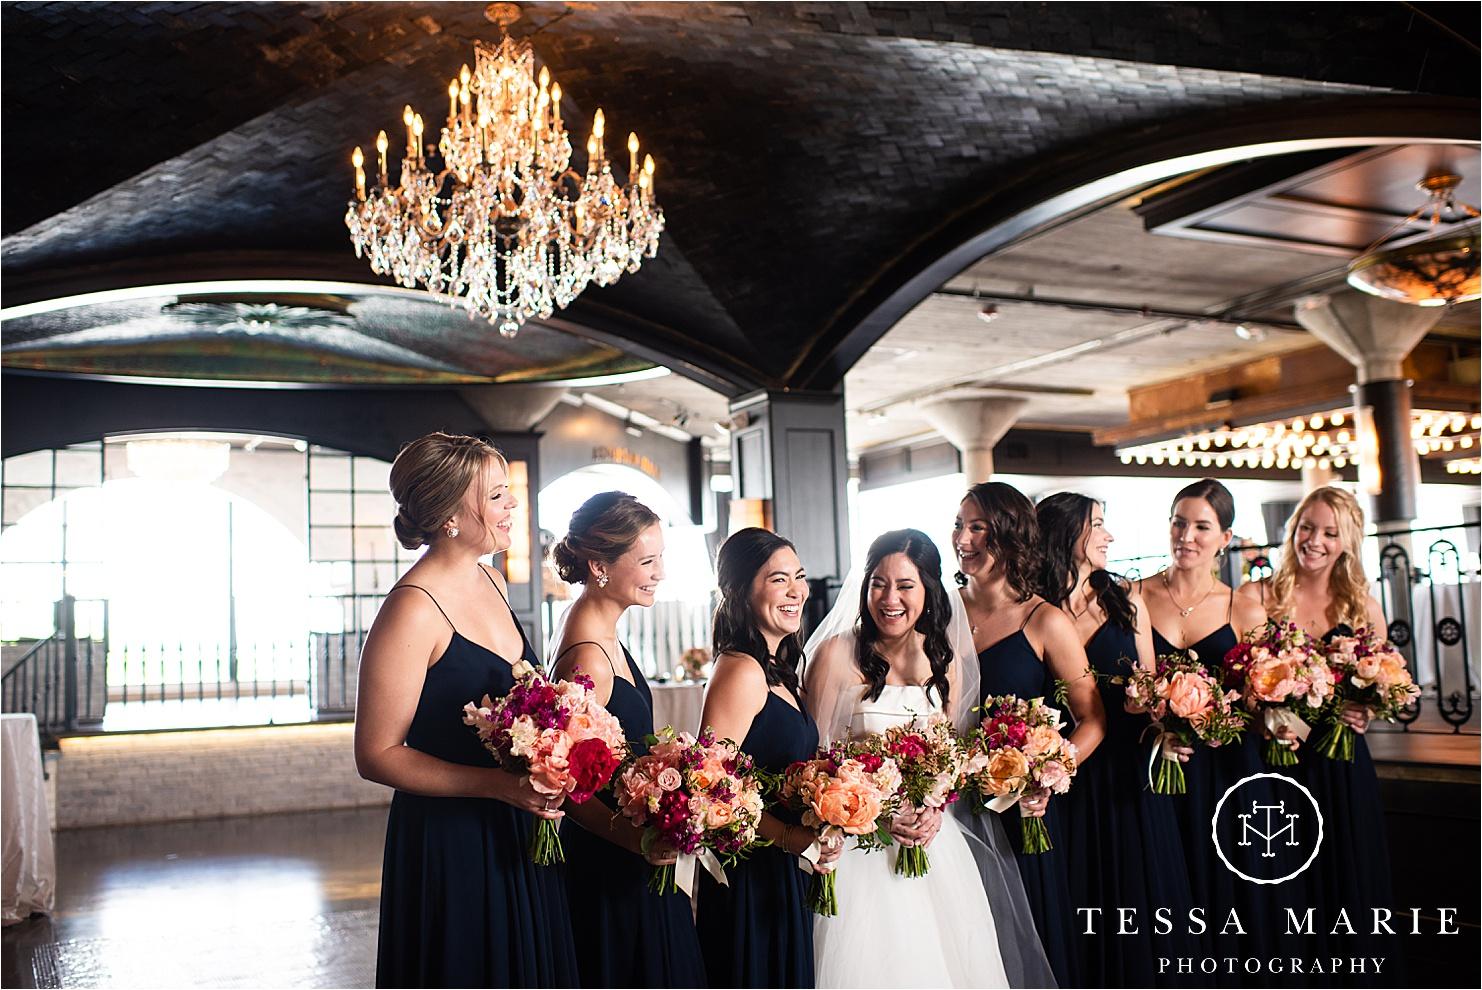 Tessa_marie_weddings_houston_wedding_photographer_The_astorian_0077.jpg